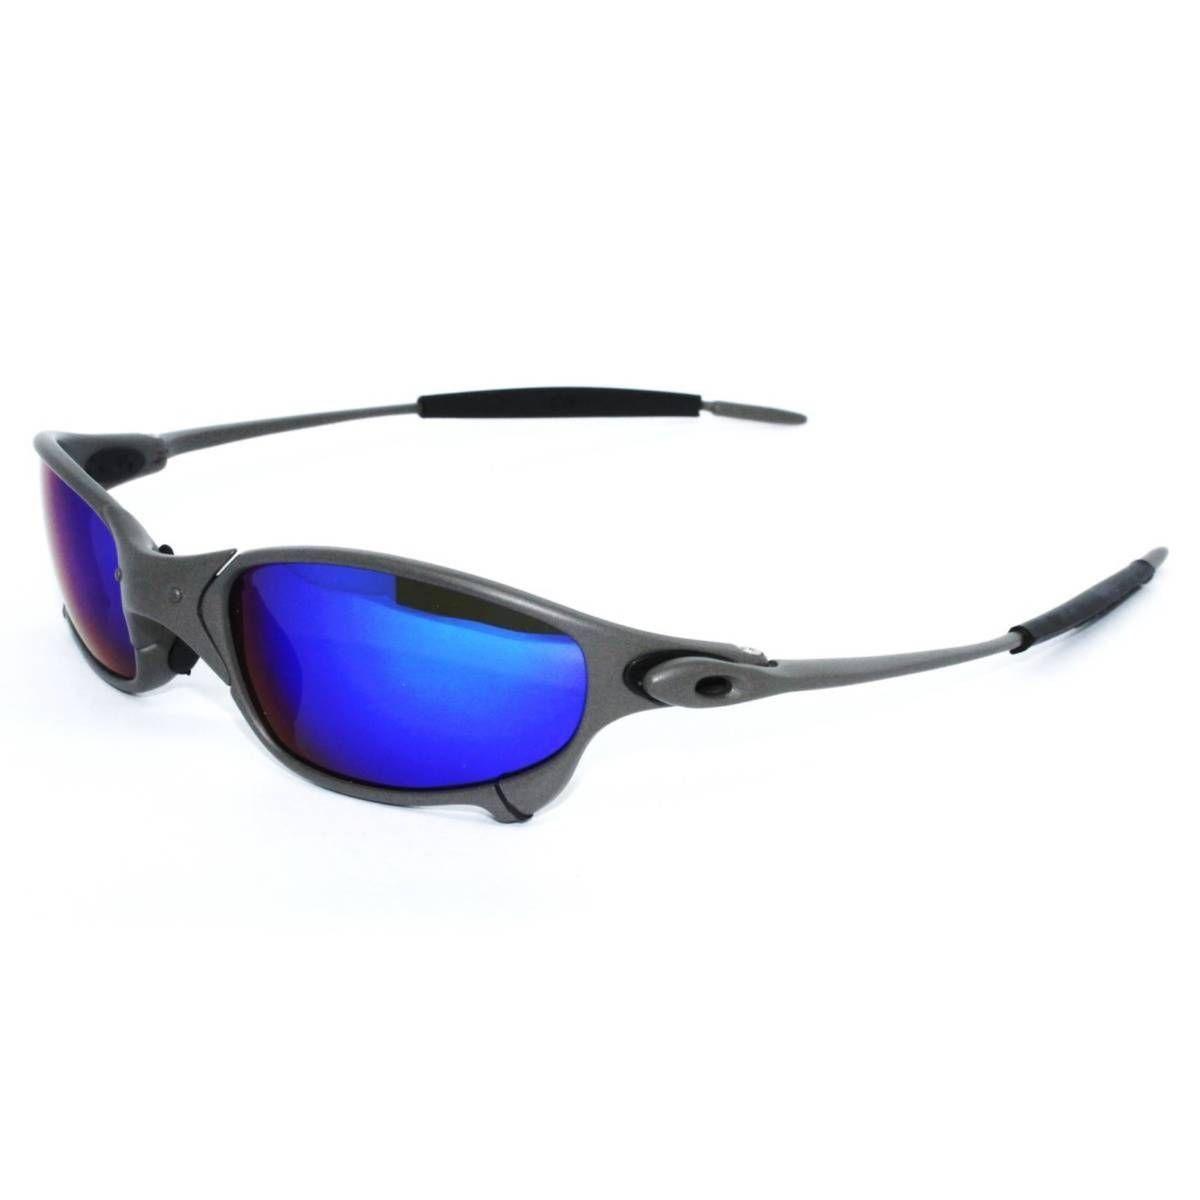 2cb8cd8cf2 Óculos Oakley Juliet 100% Polarizado Promoção!!!